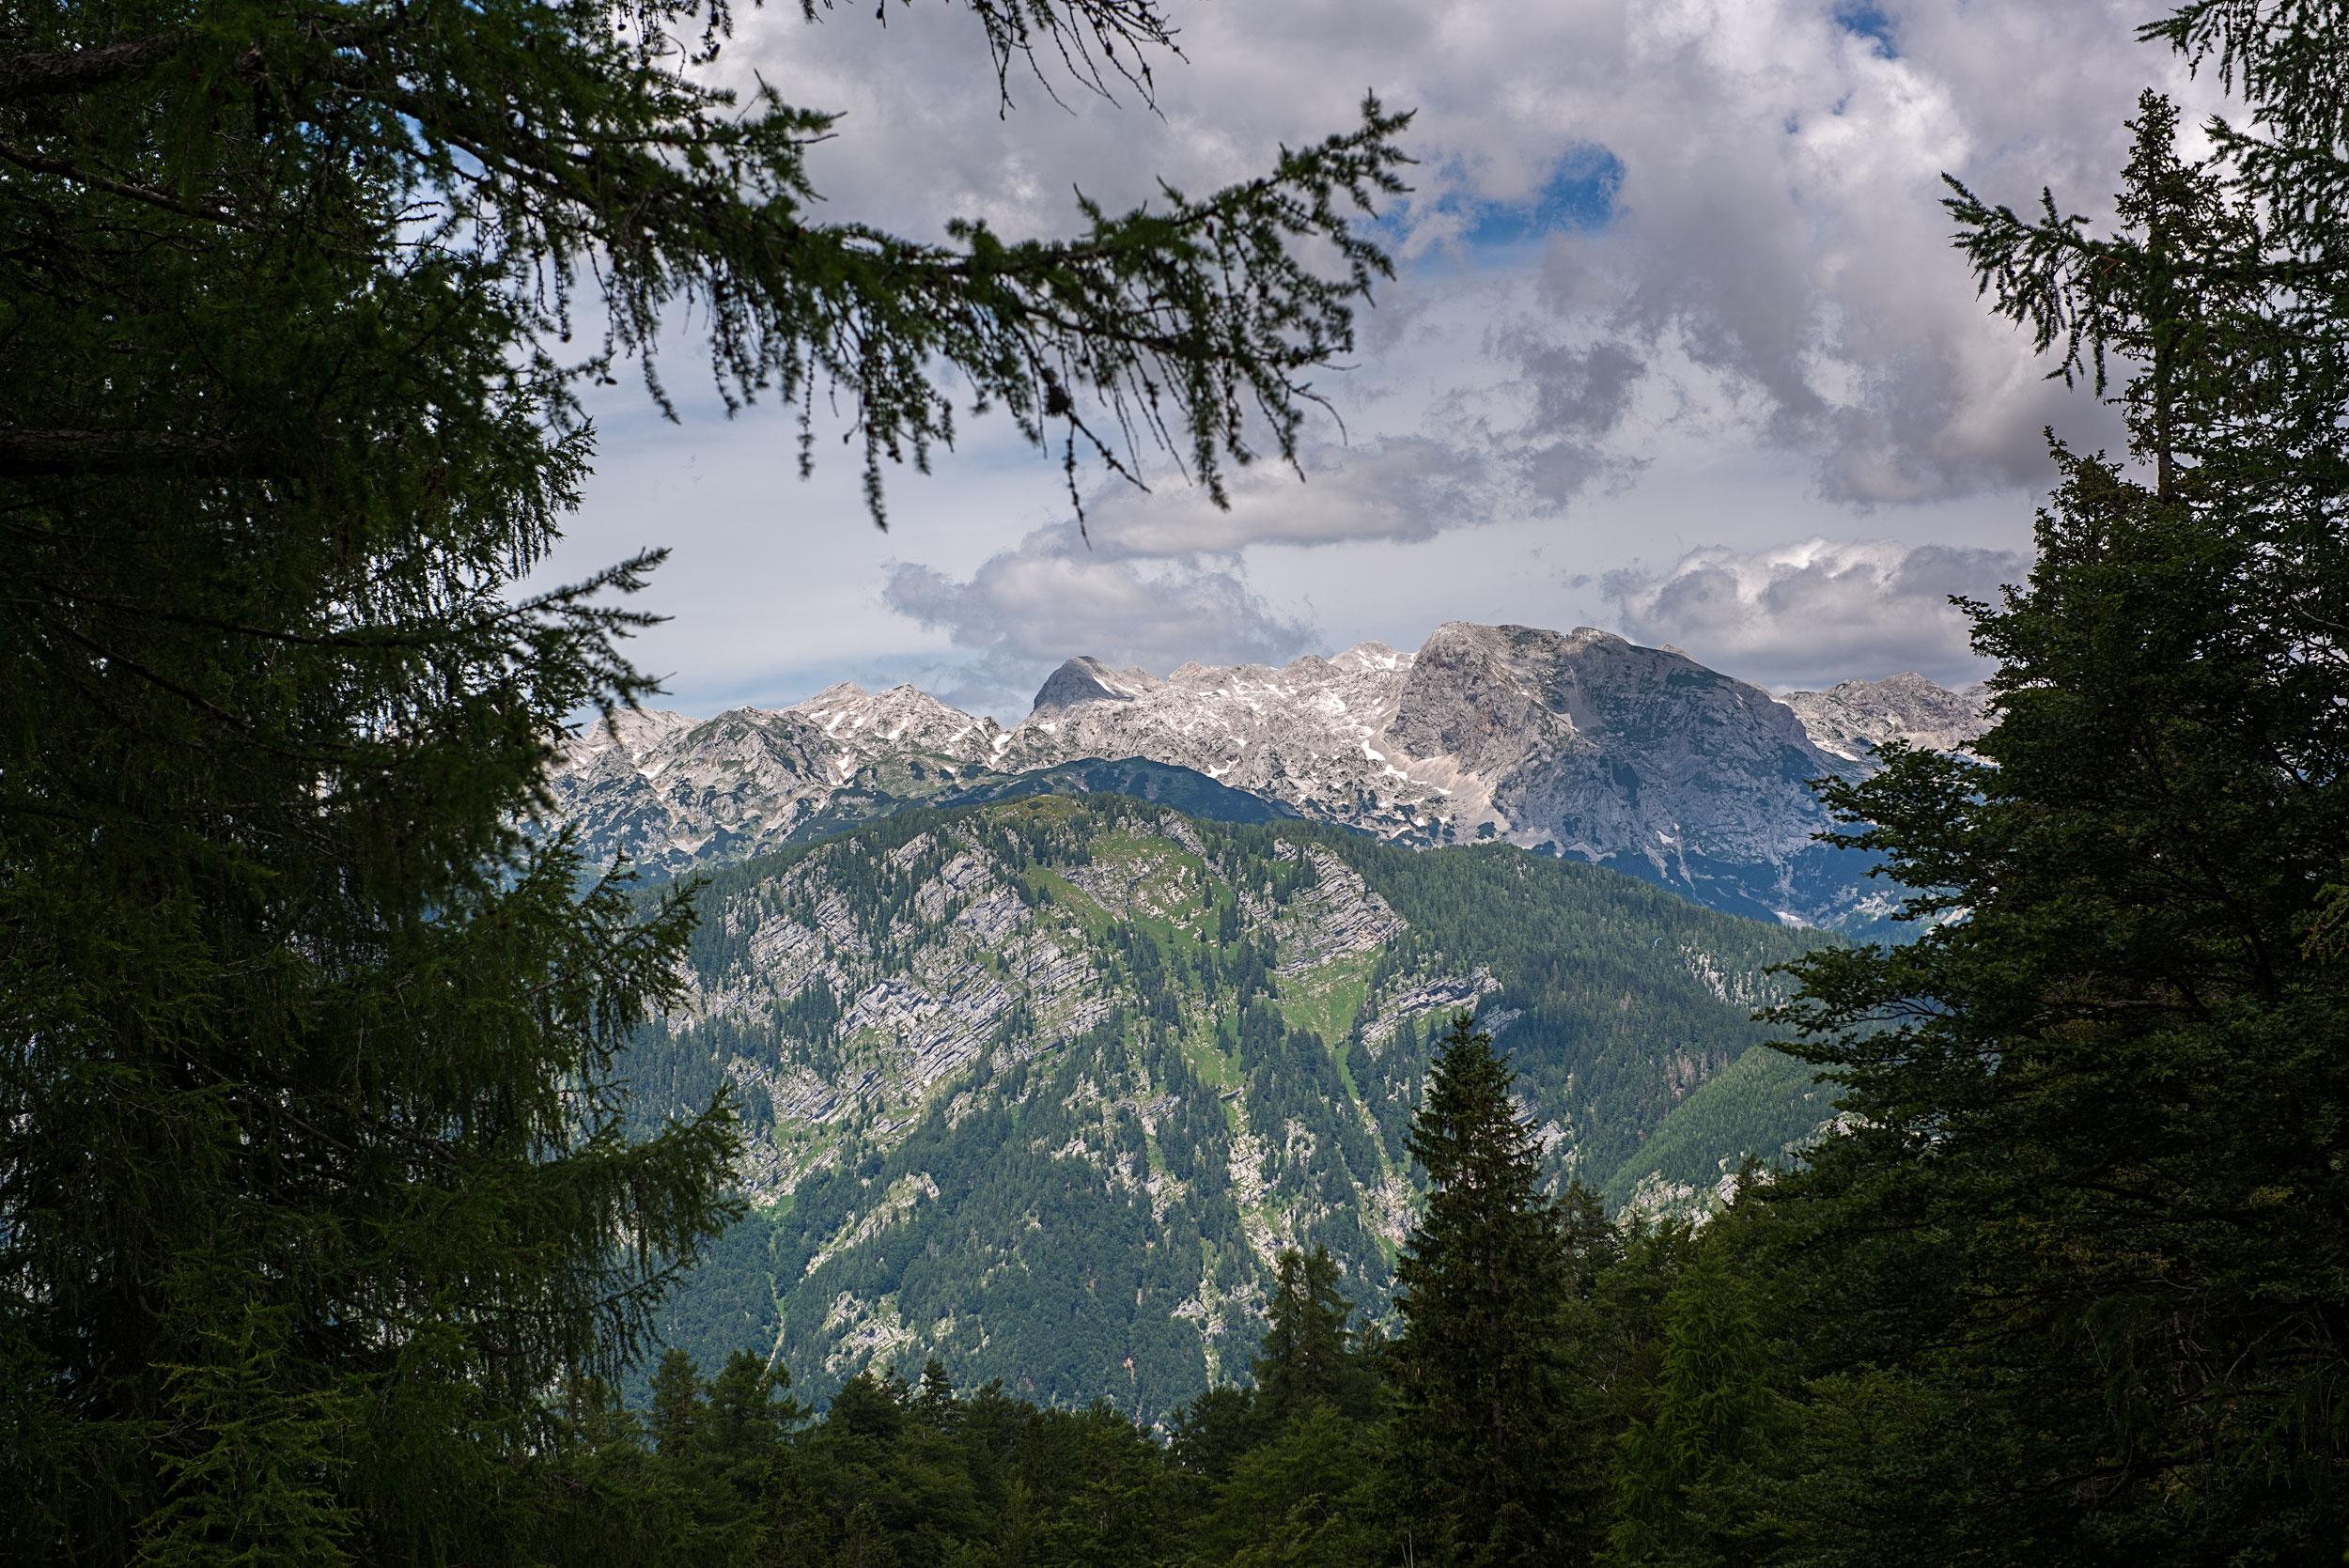 Ascenso al Vrsik